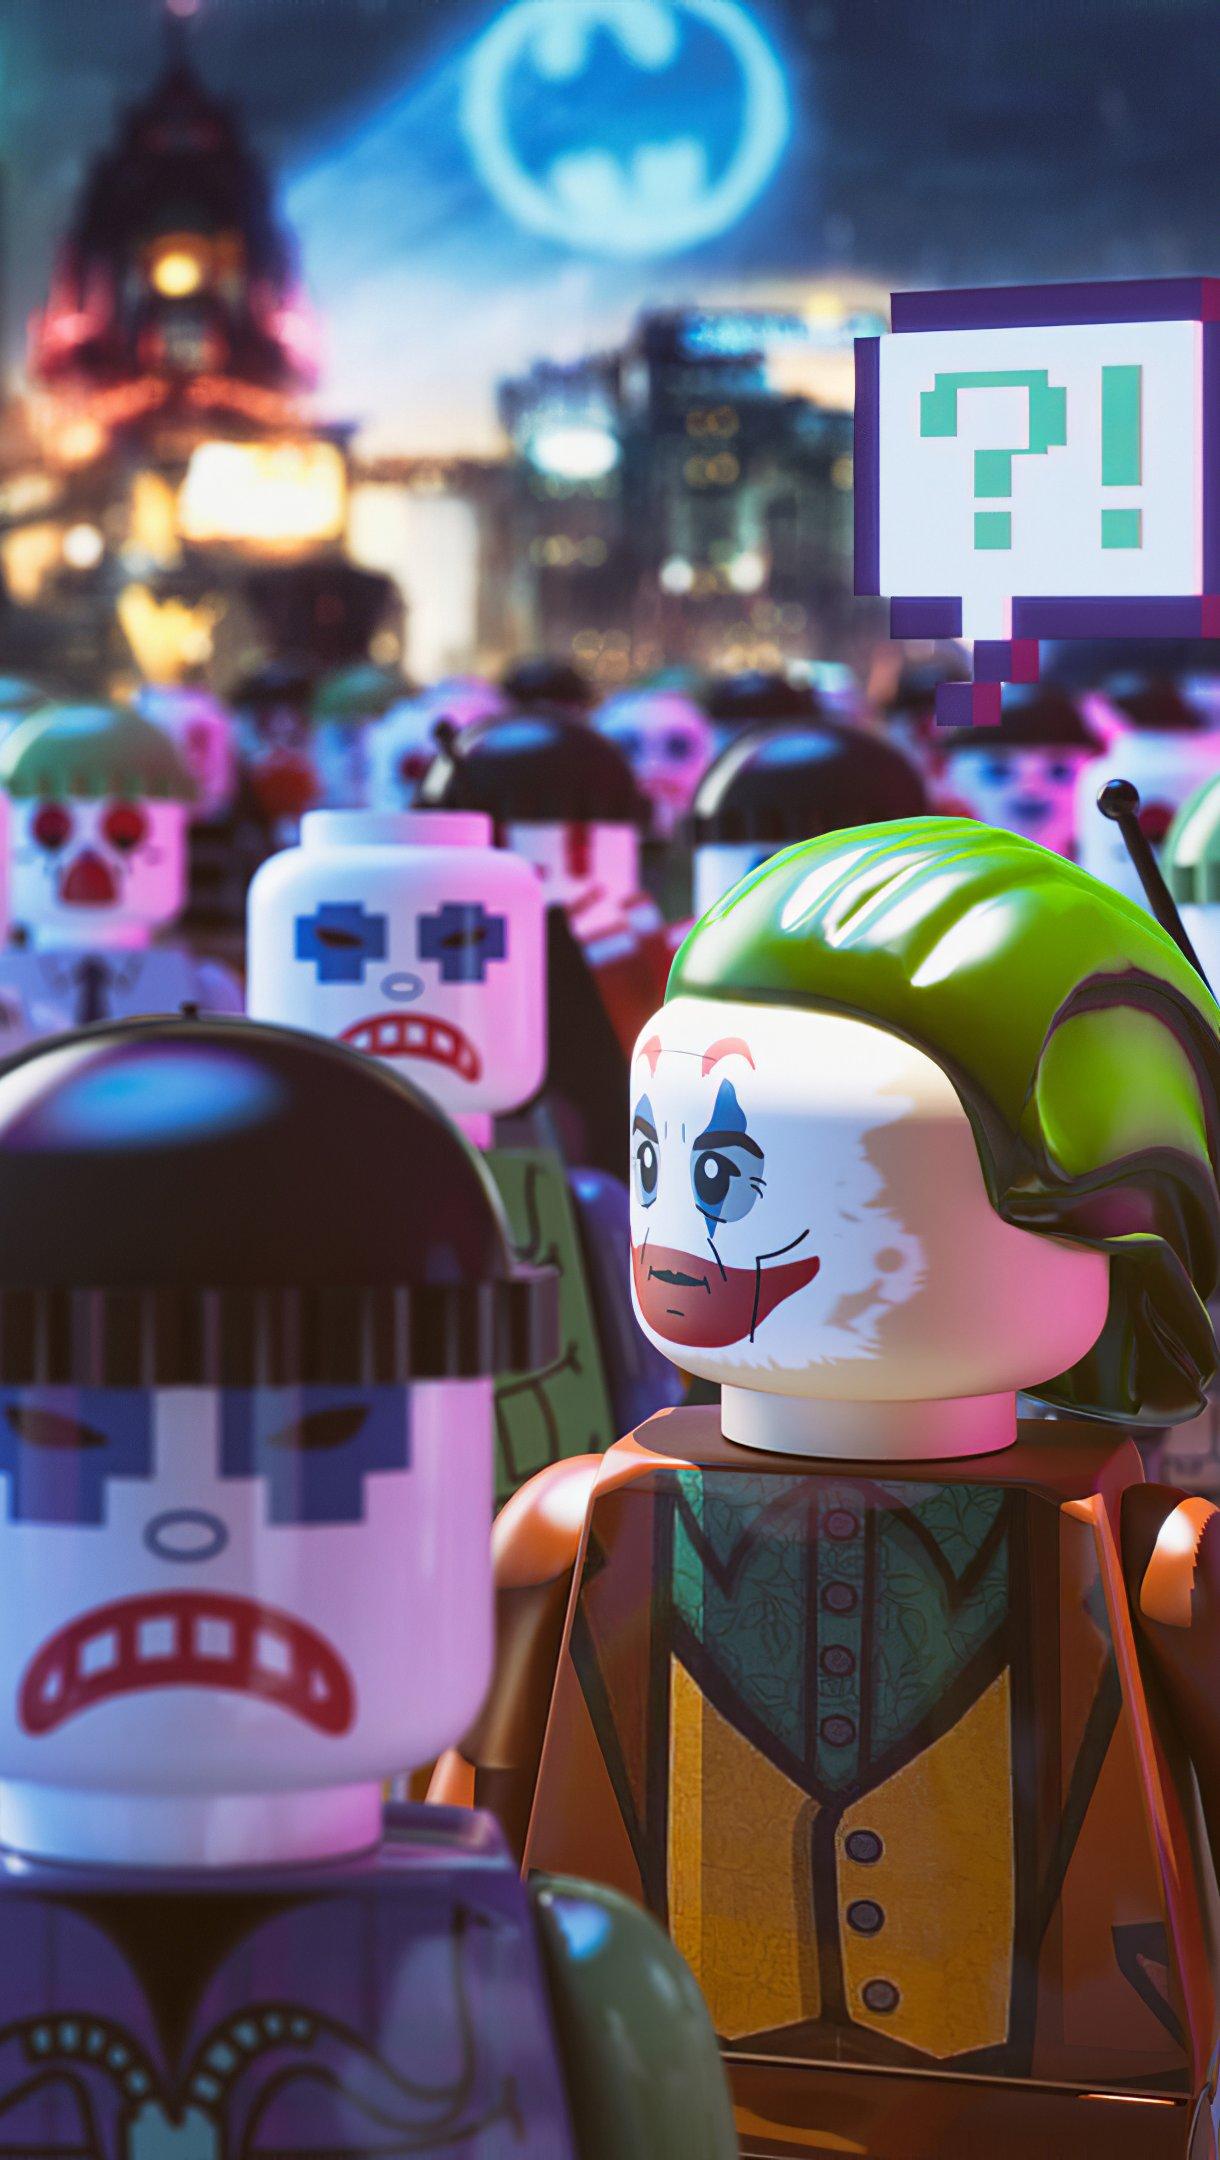 Fondos de pantalla Versiones del Guasón Lego Vertical